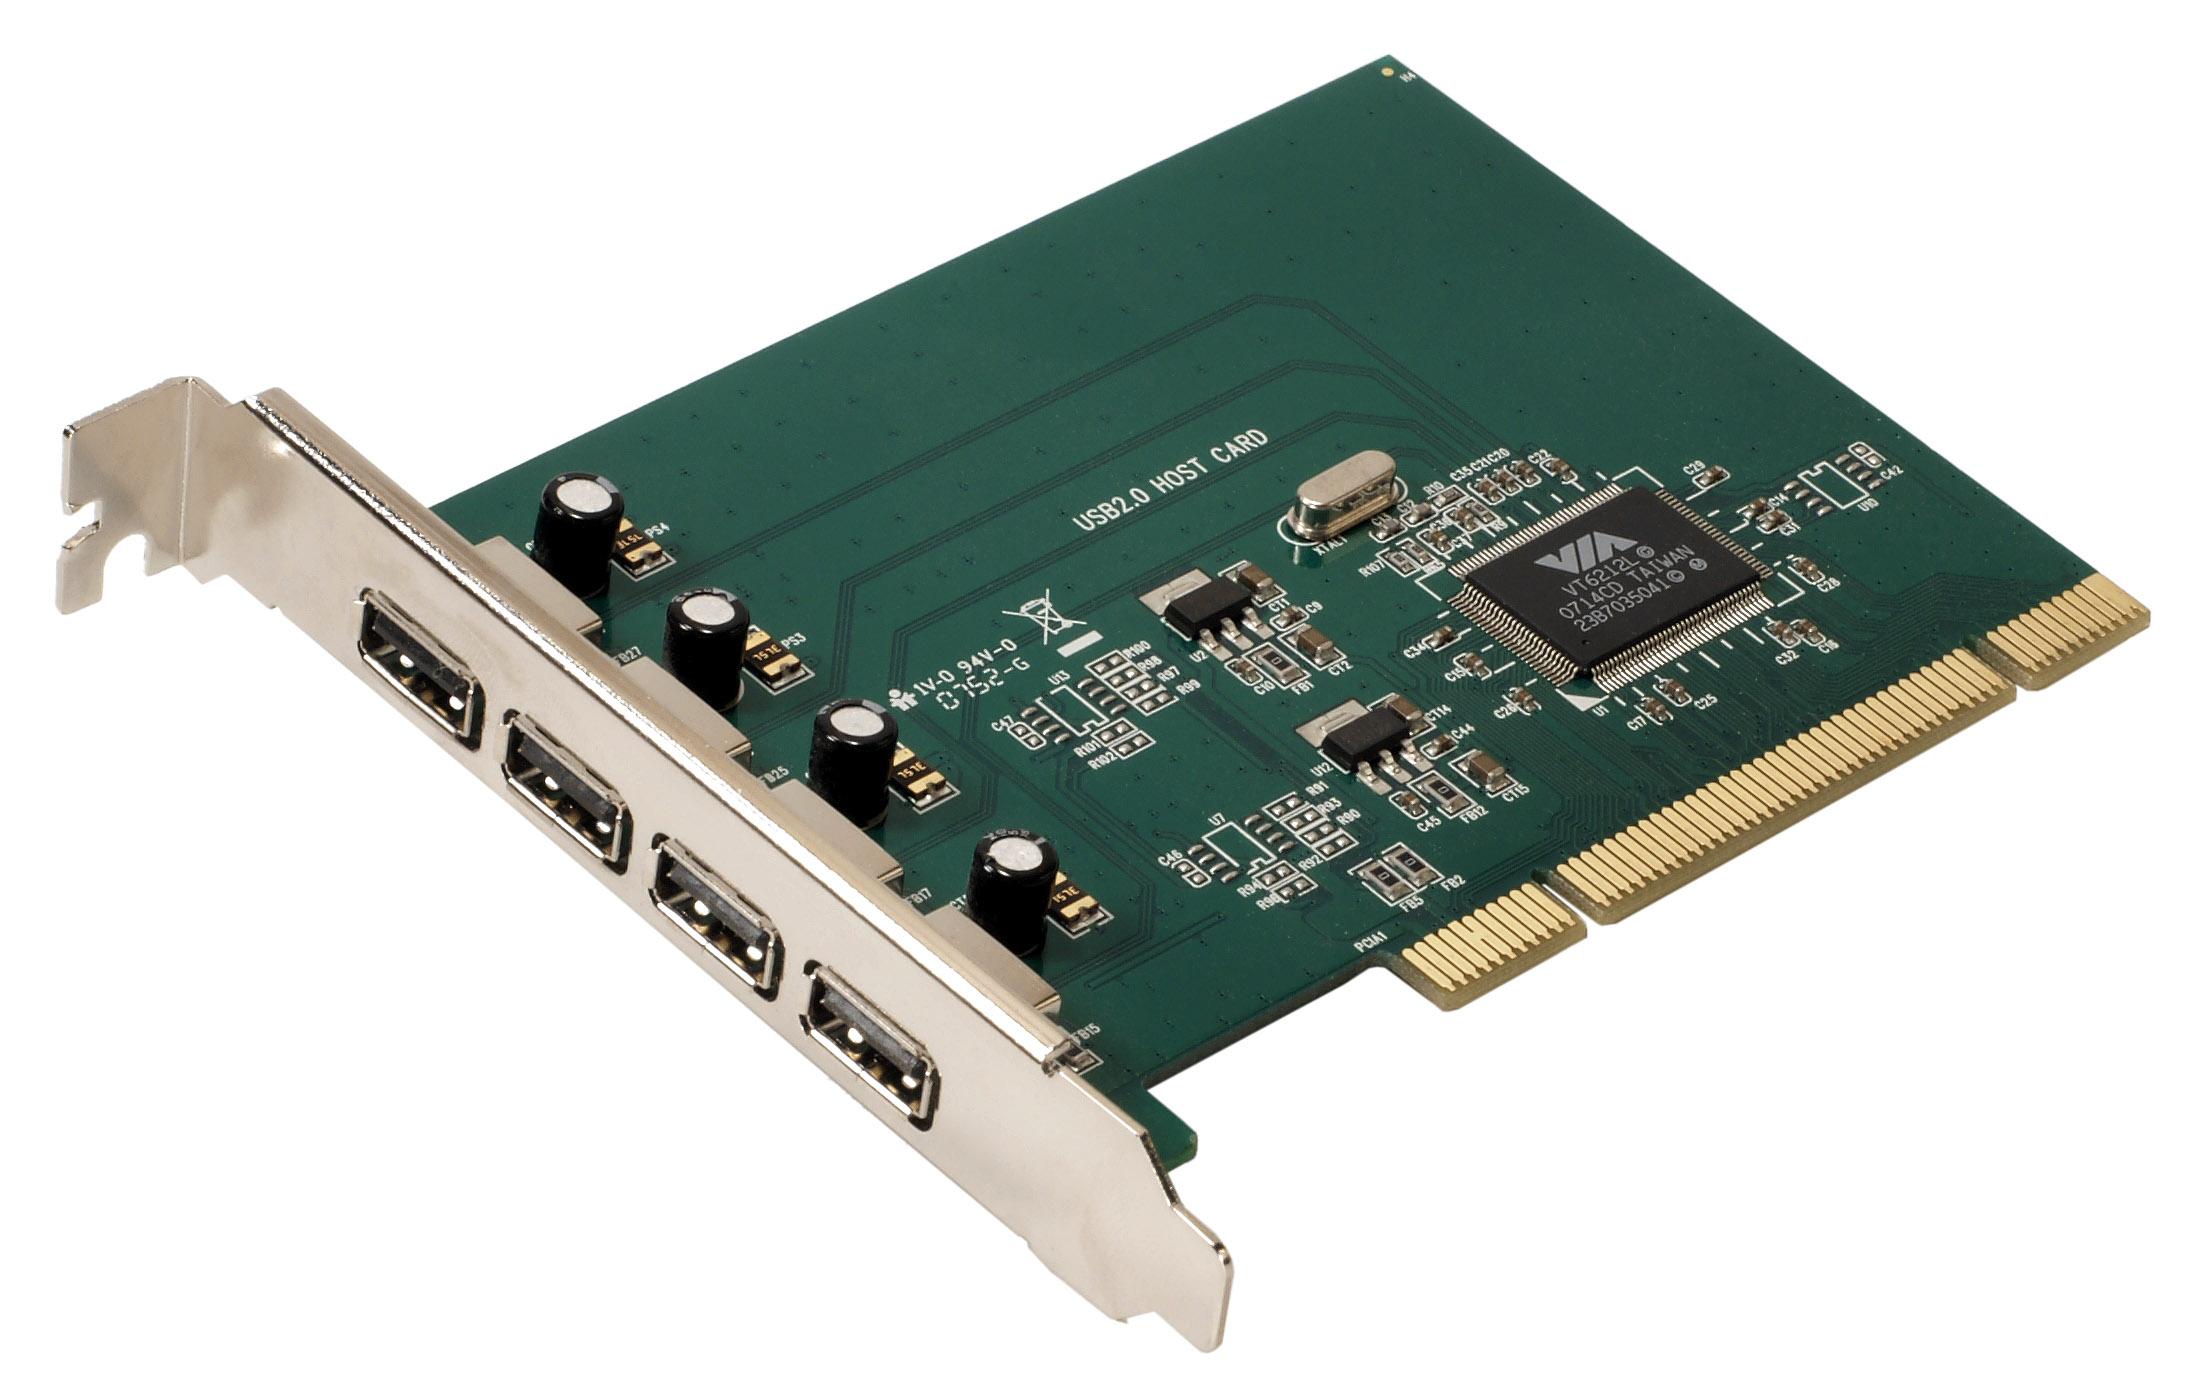 6FT Console Cable Configure Practical USB Configure Cable Debug Line for PC 2019